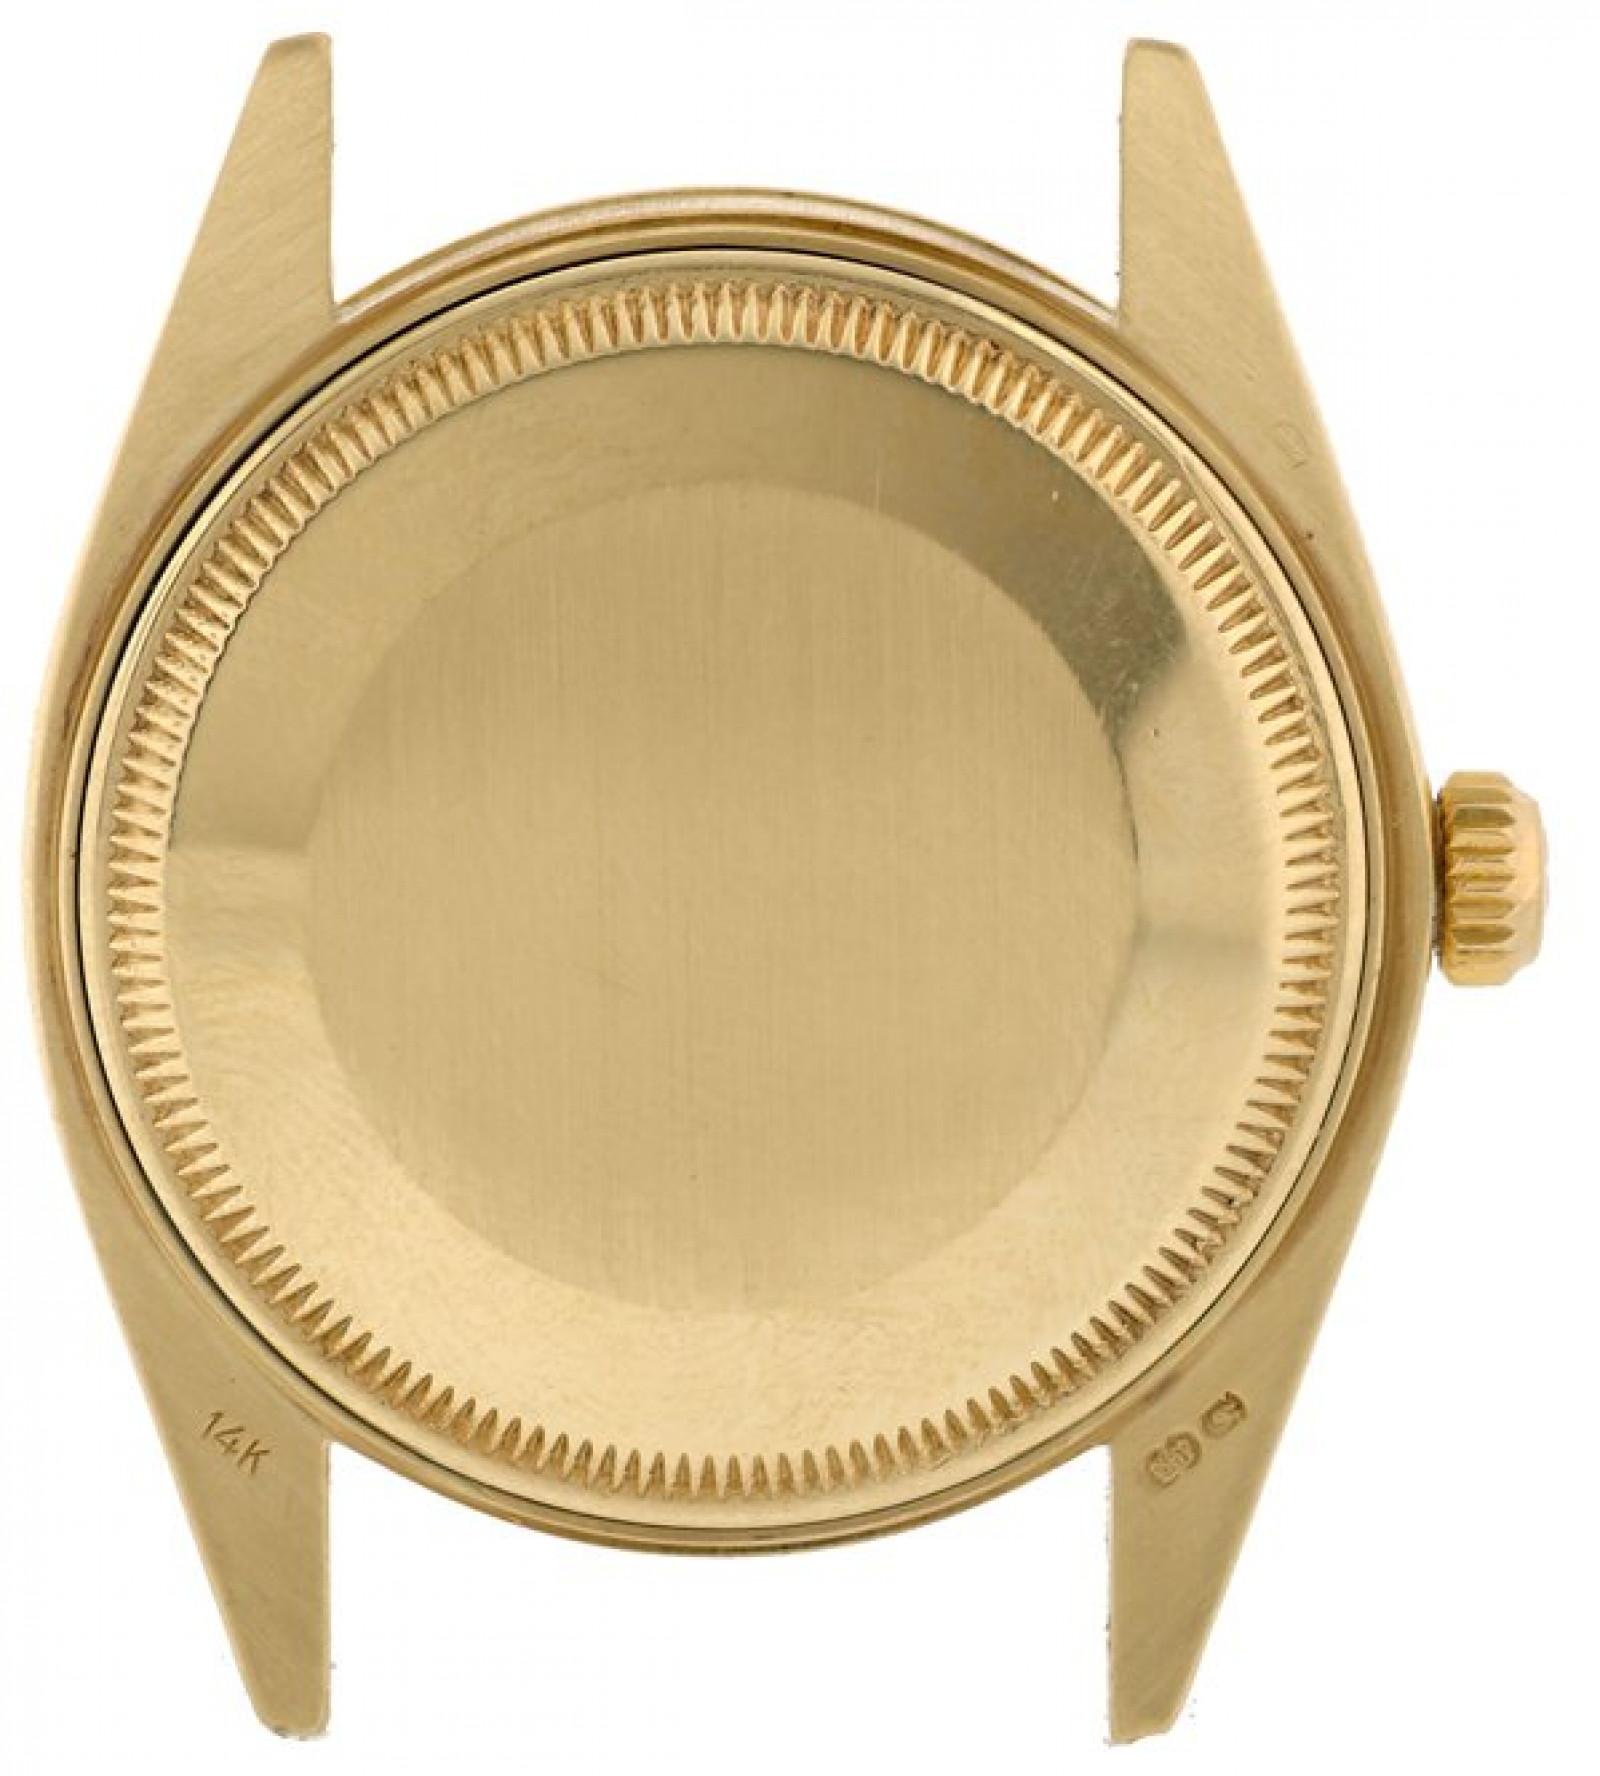 Vintage Rare Rolex Date 1503 Gold Year 1980